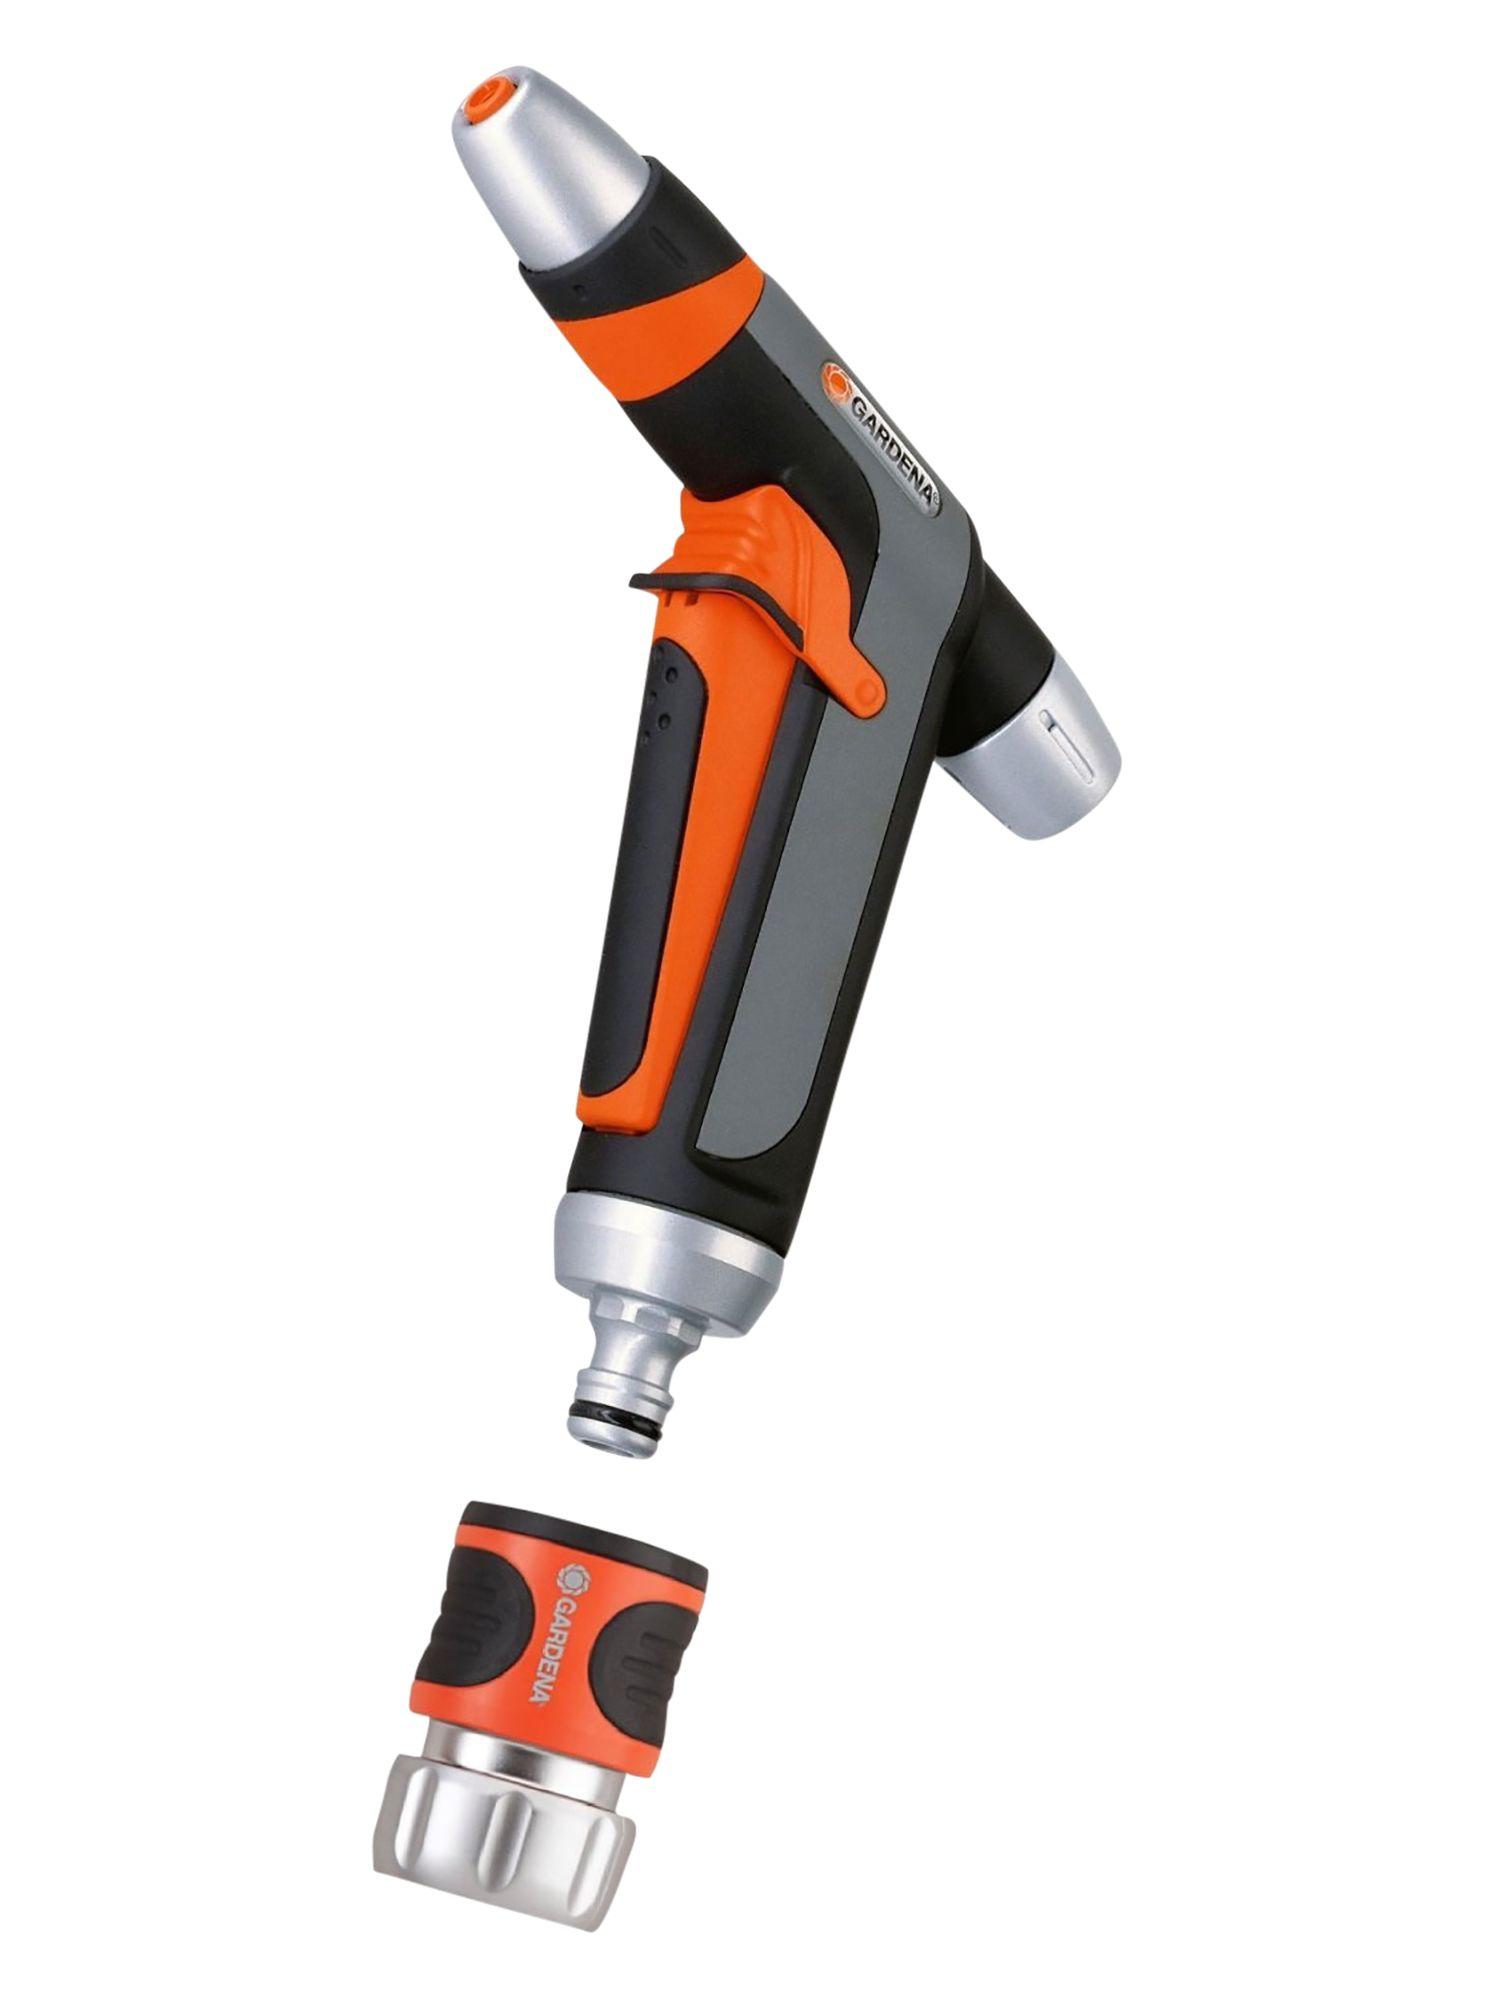 Pin On Hose Spray Nozzle And Water Spray Gun